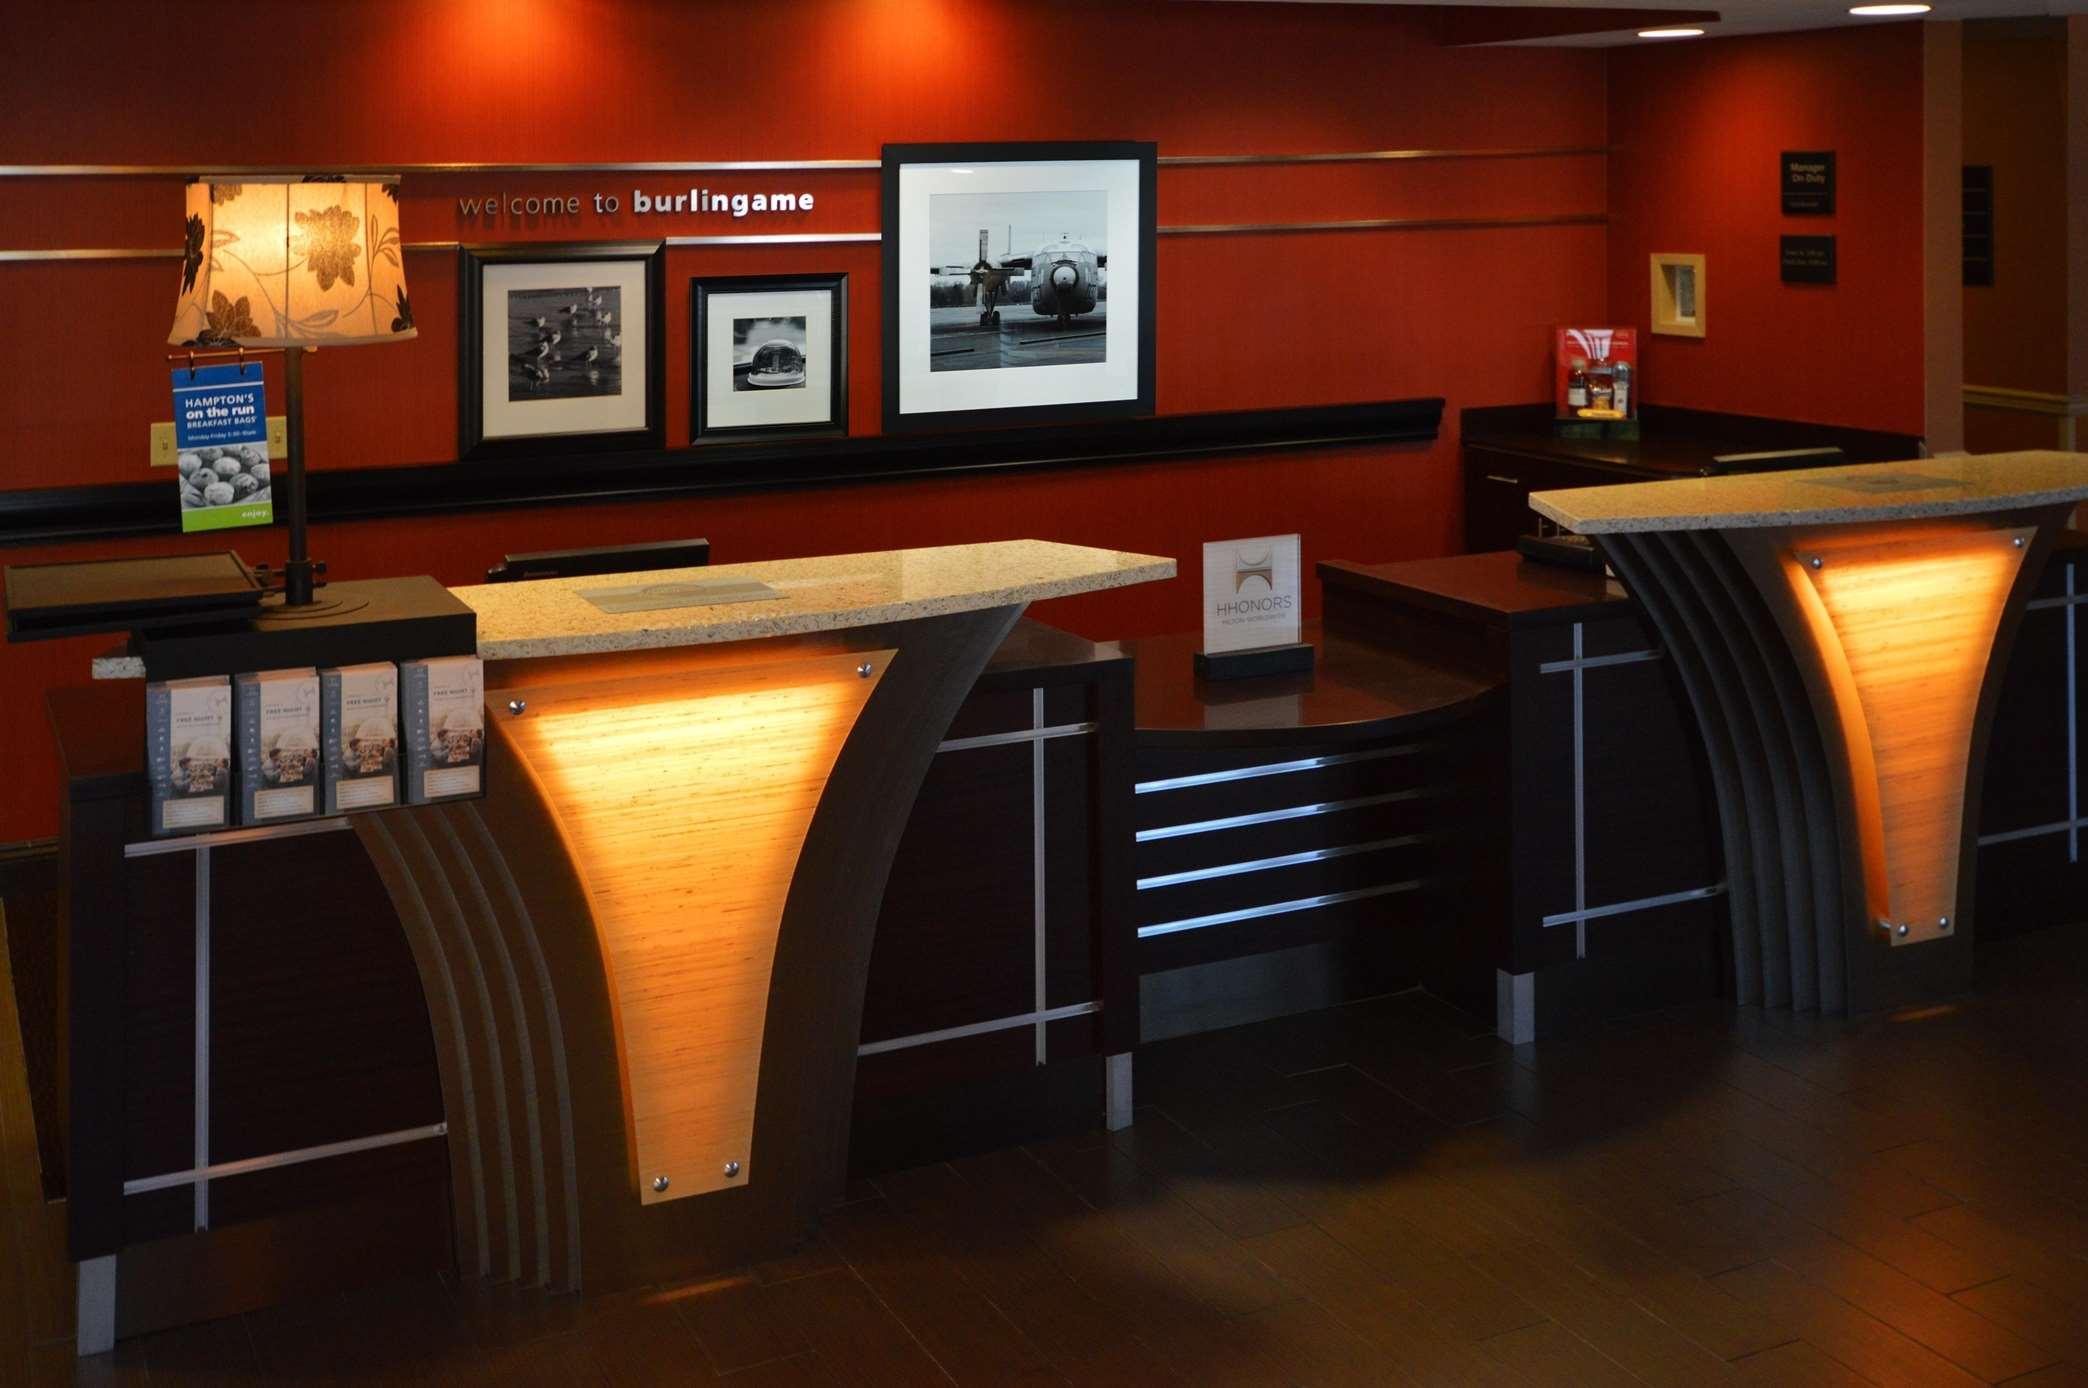 Hampton Inn & Suites San Francisco-Burlingame-Airport South image 3